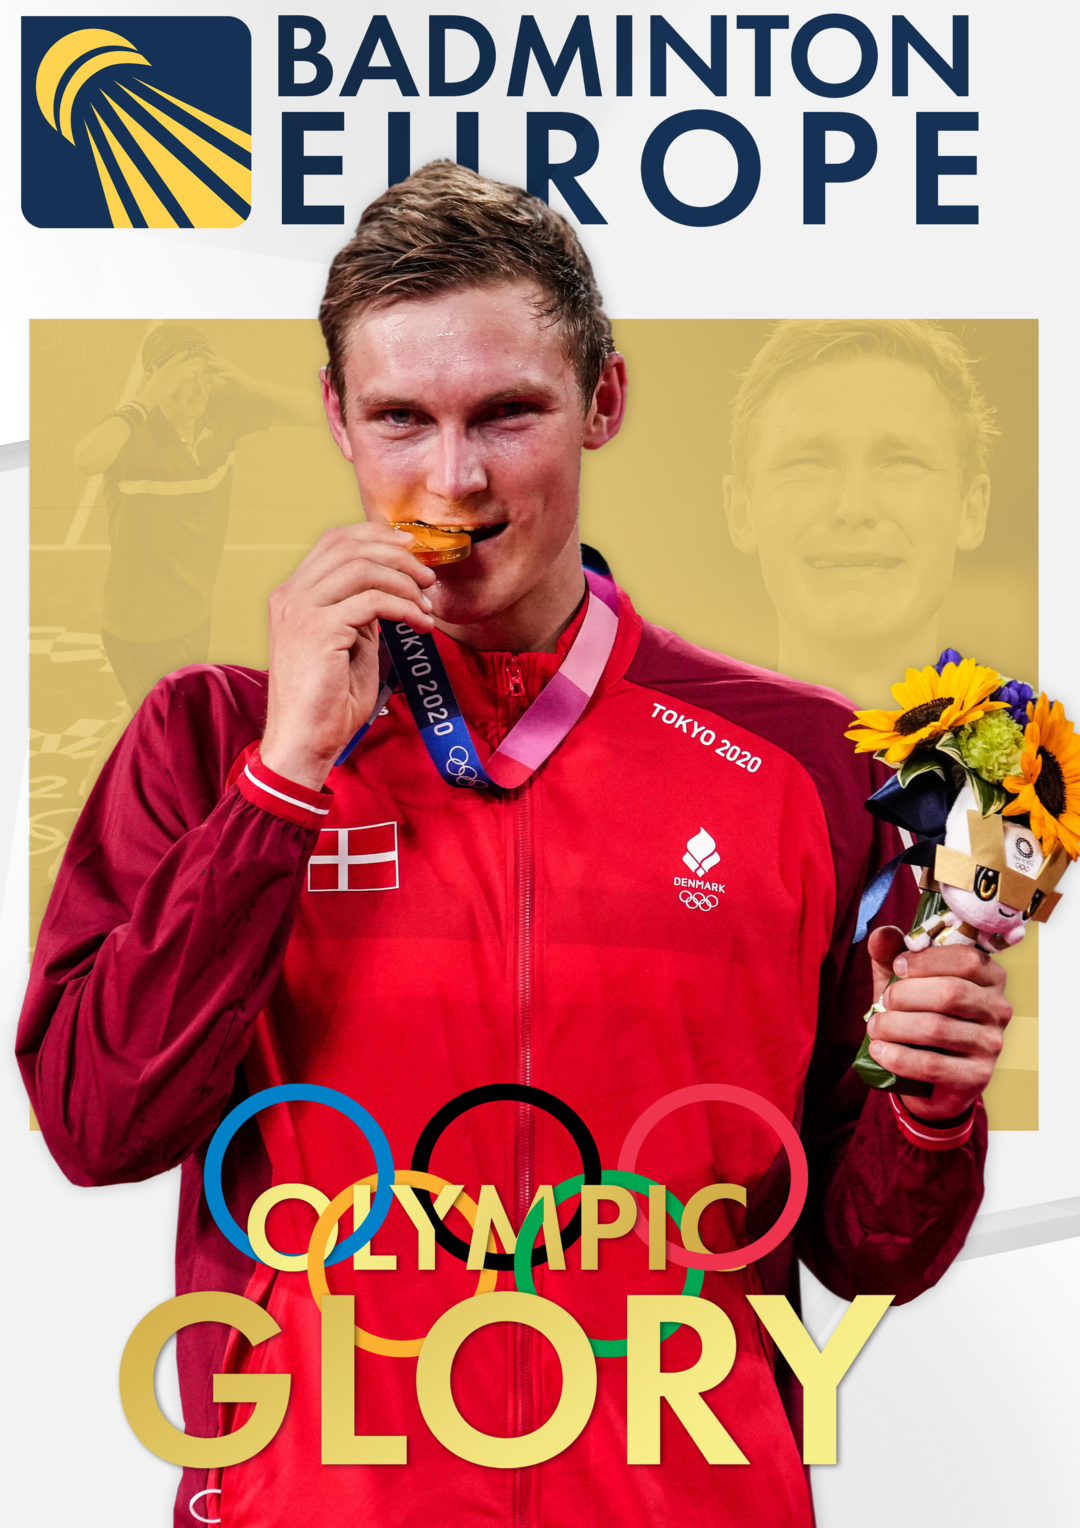 Page 1 of Olympic Glory - Badminton Europe Magazine issue 34